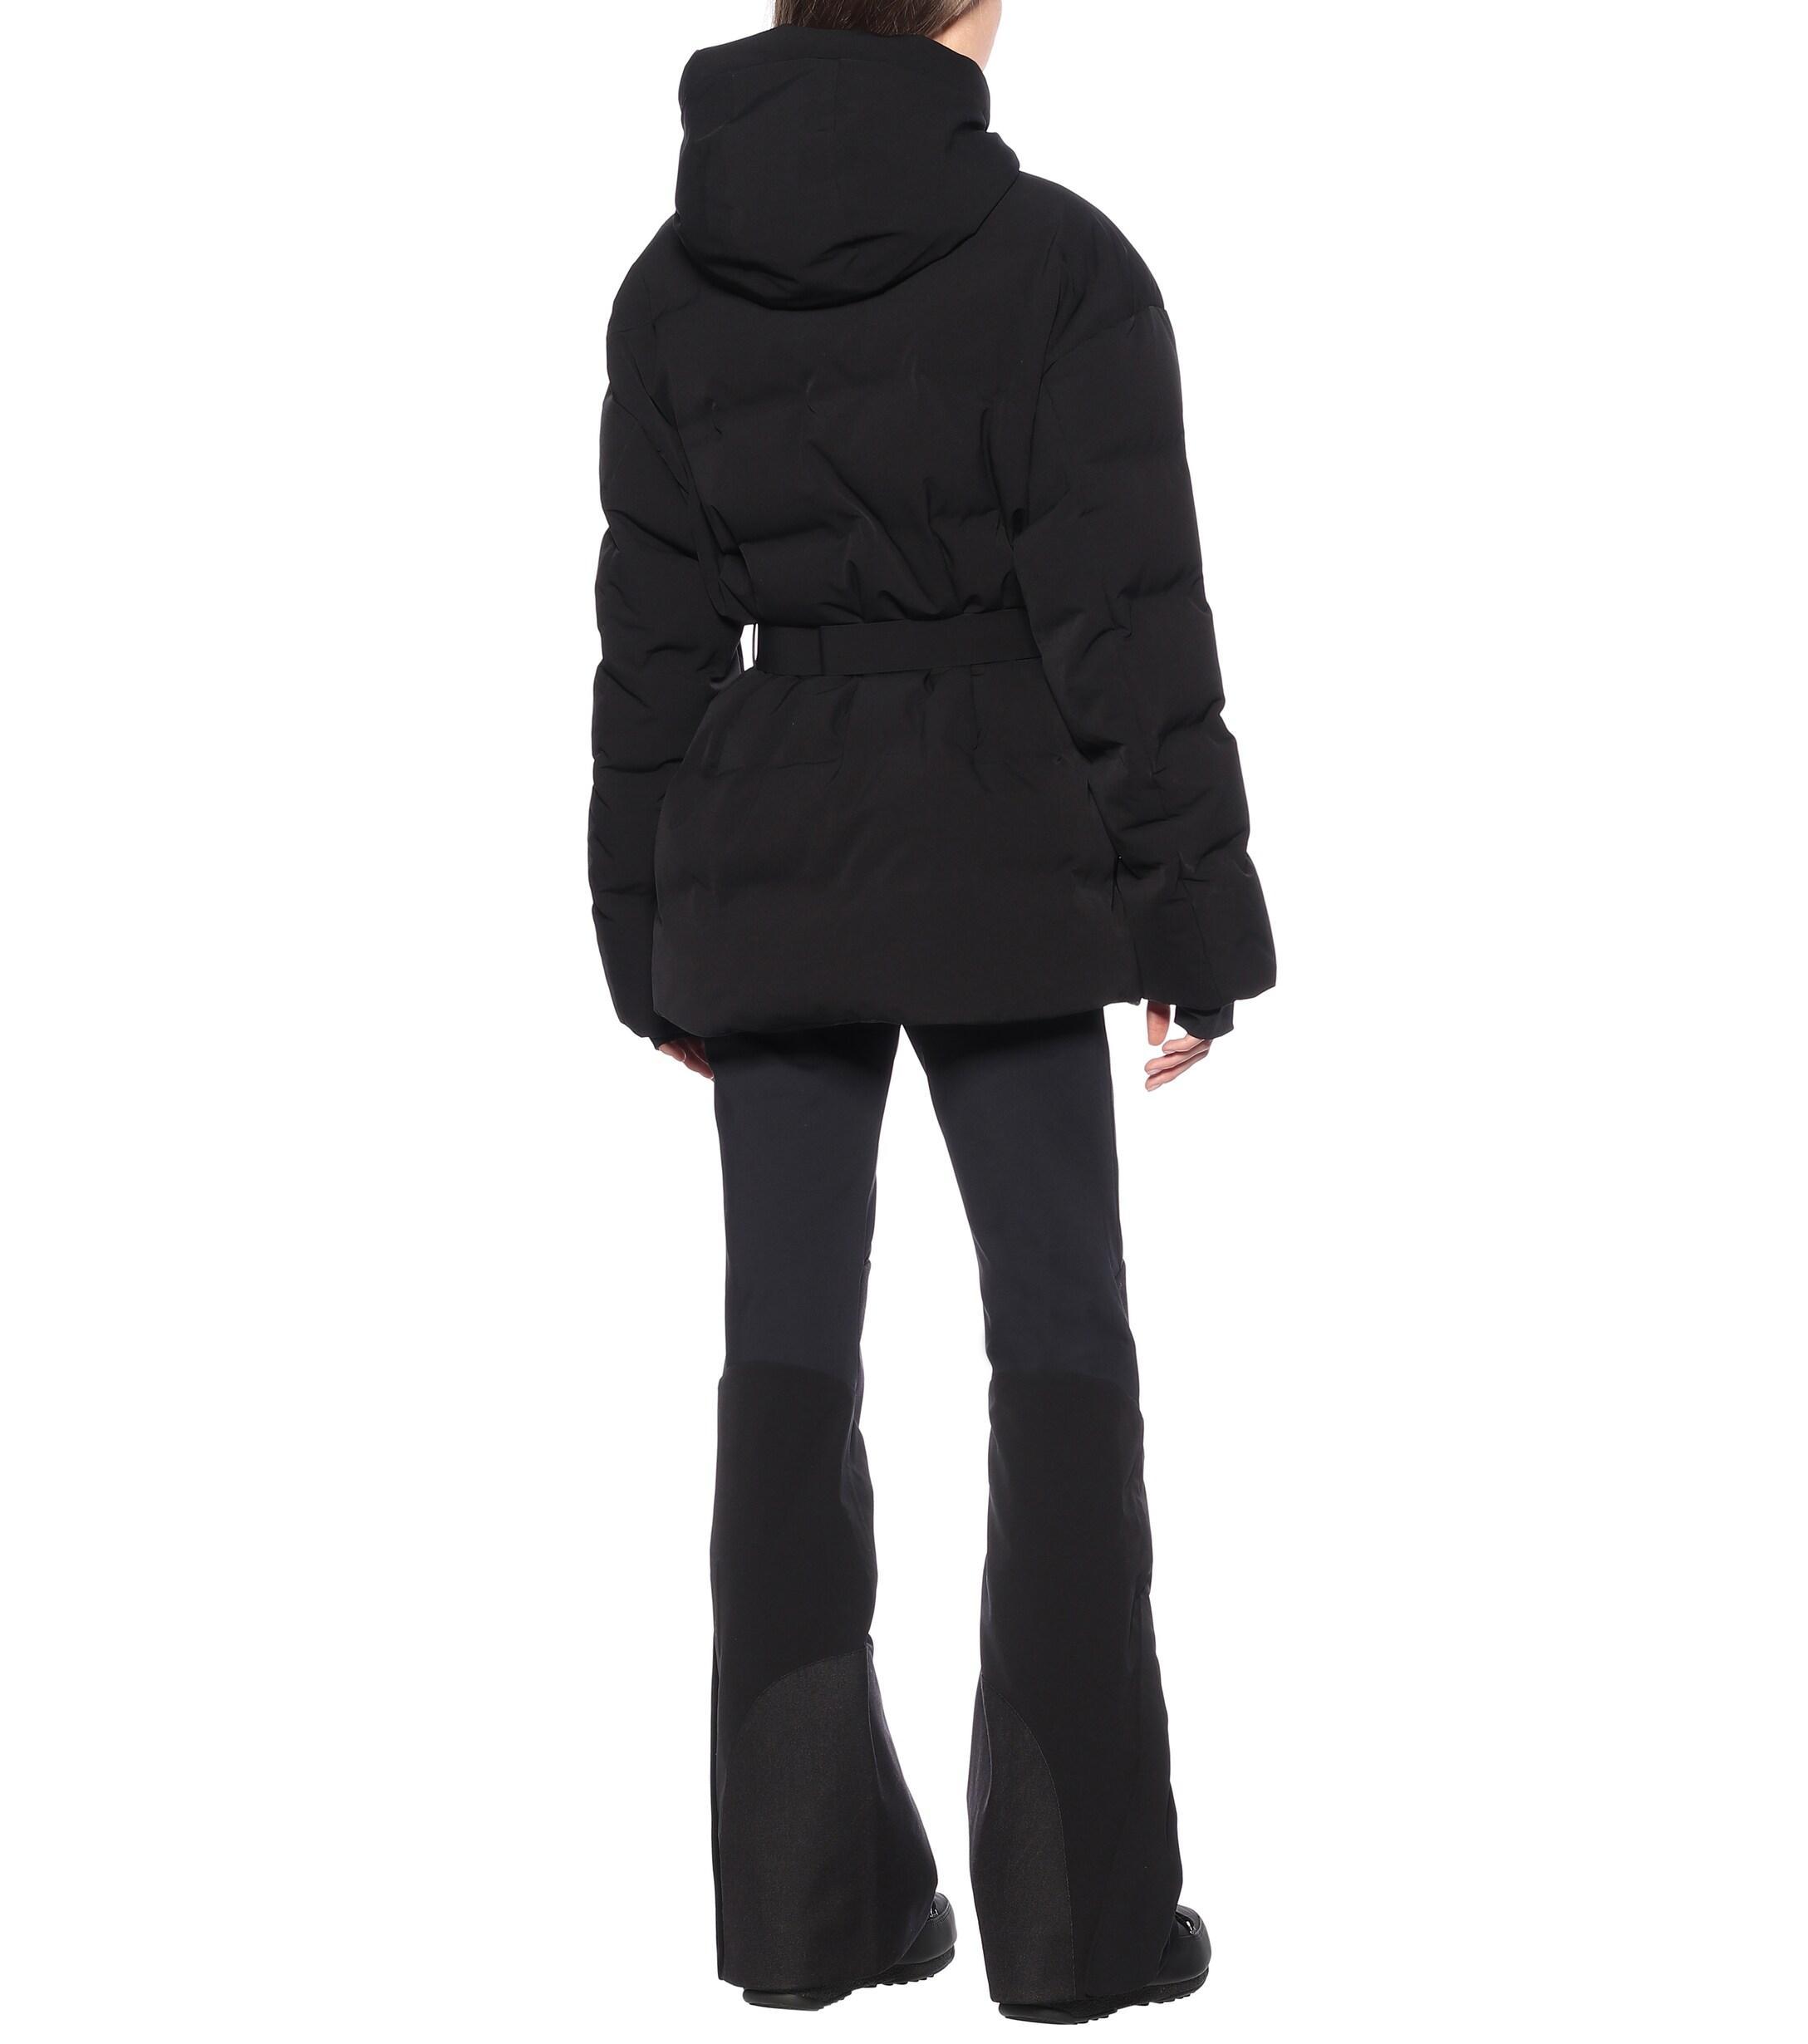 Chaqueta de esquí de plumas Sheena Ienki Ienki de color Negro